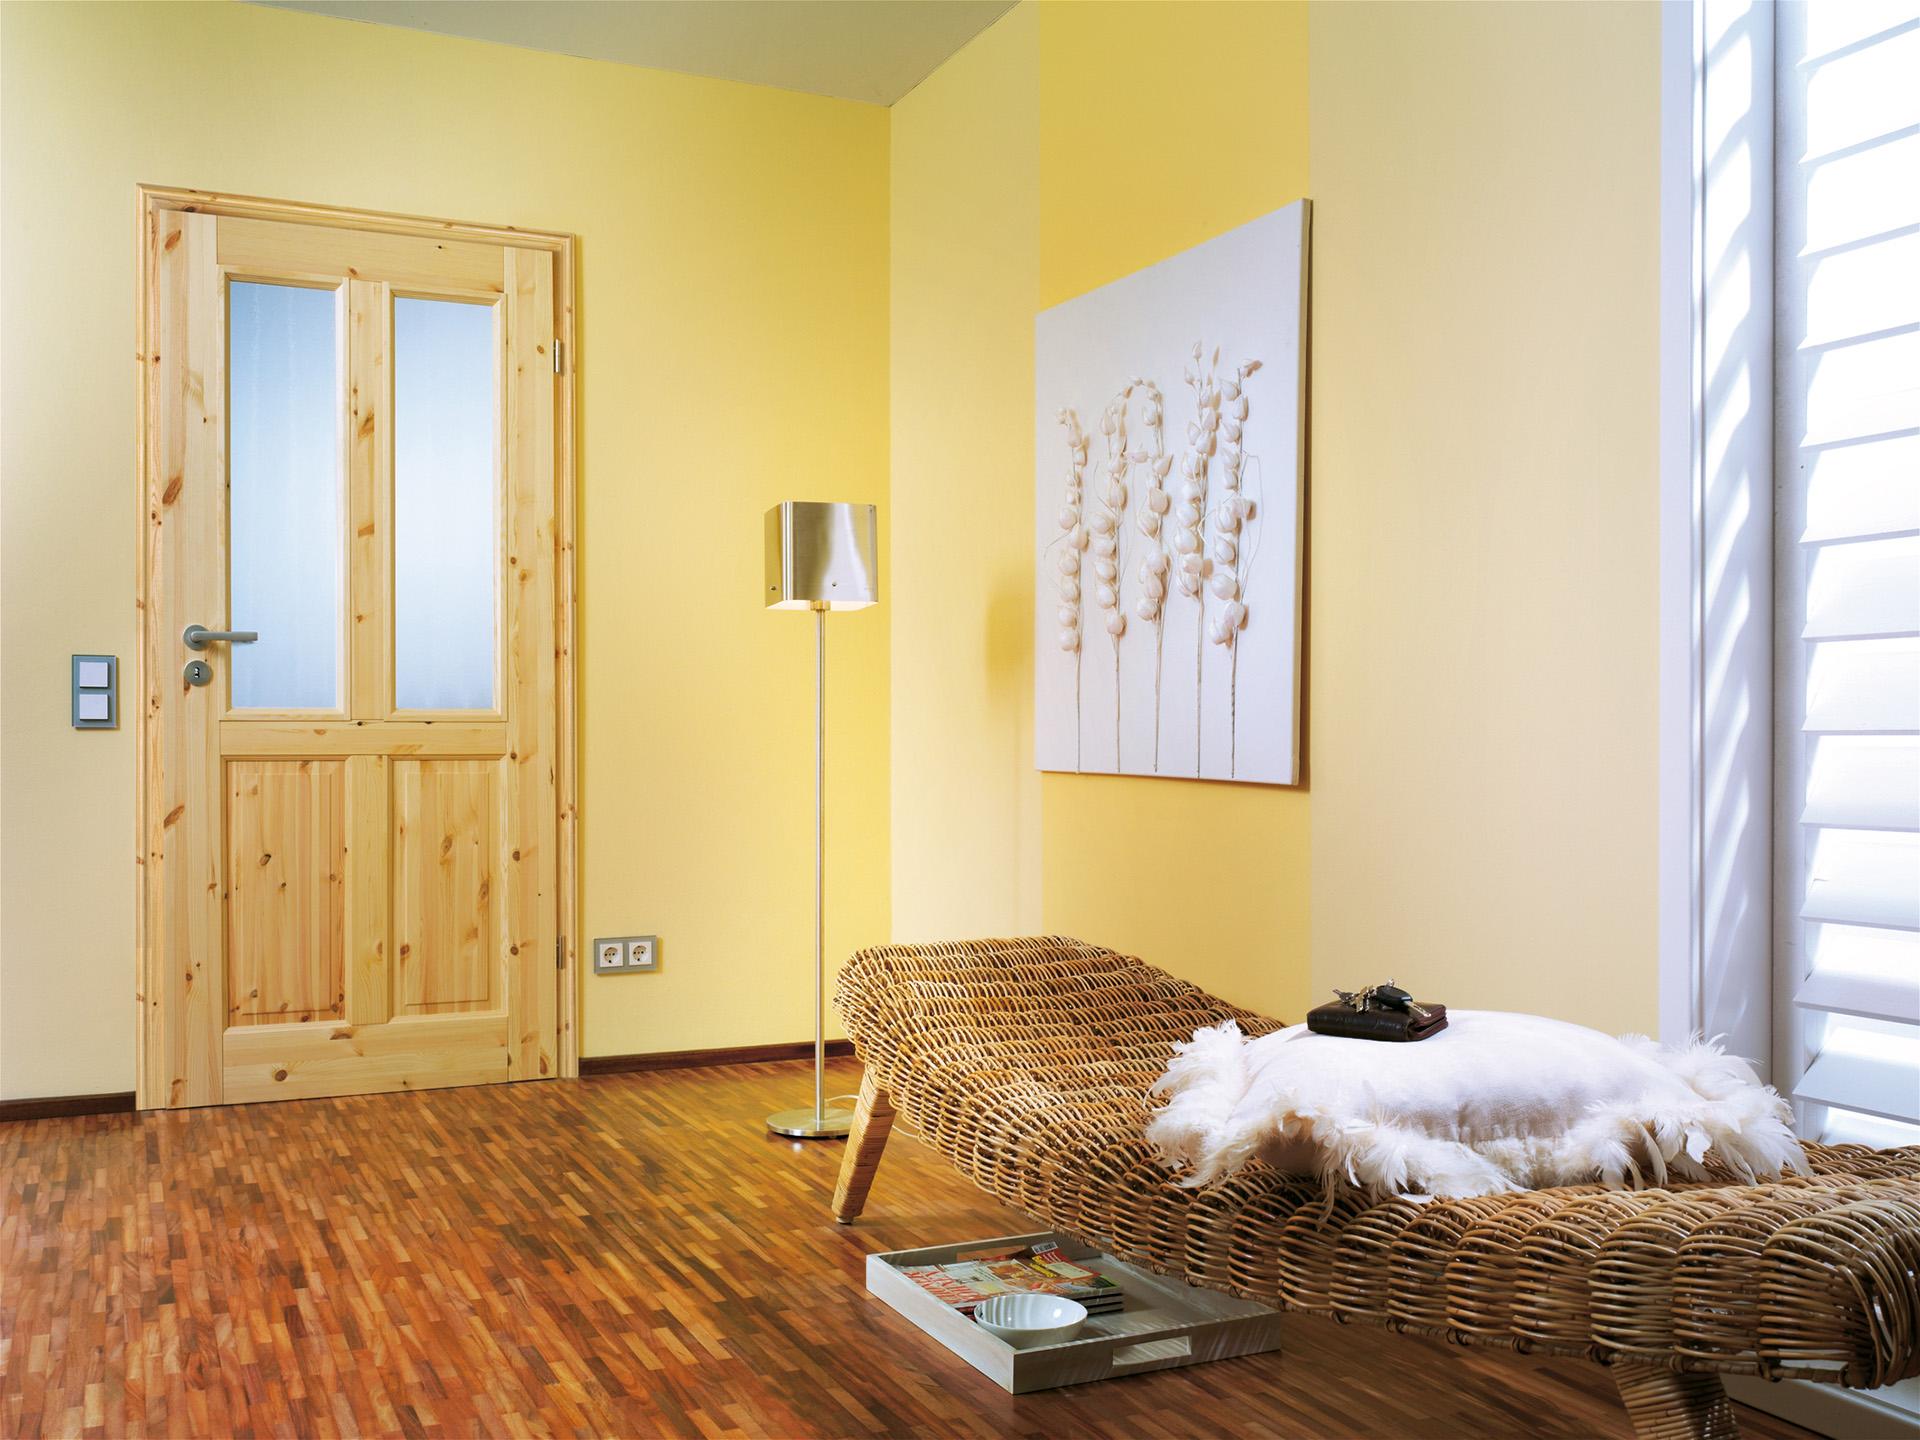 der t r den passenden rahmen geben. Black Bedroom Furniture Sets. Home Design Ideas